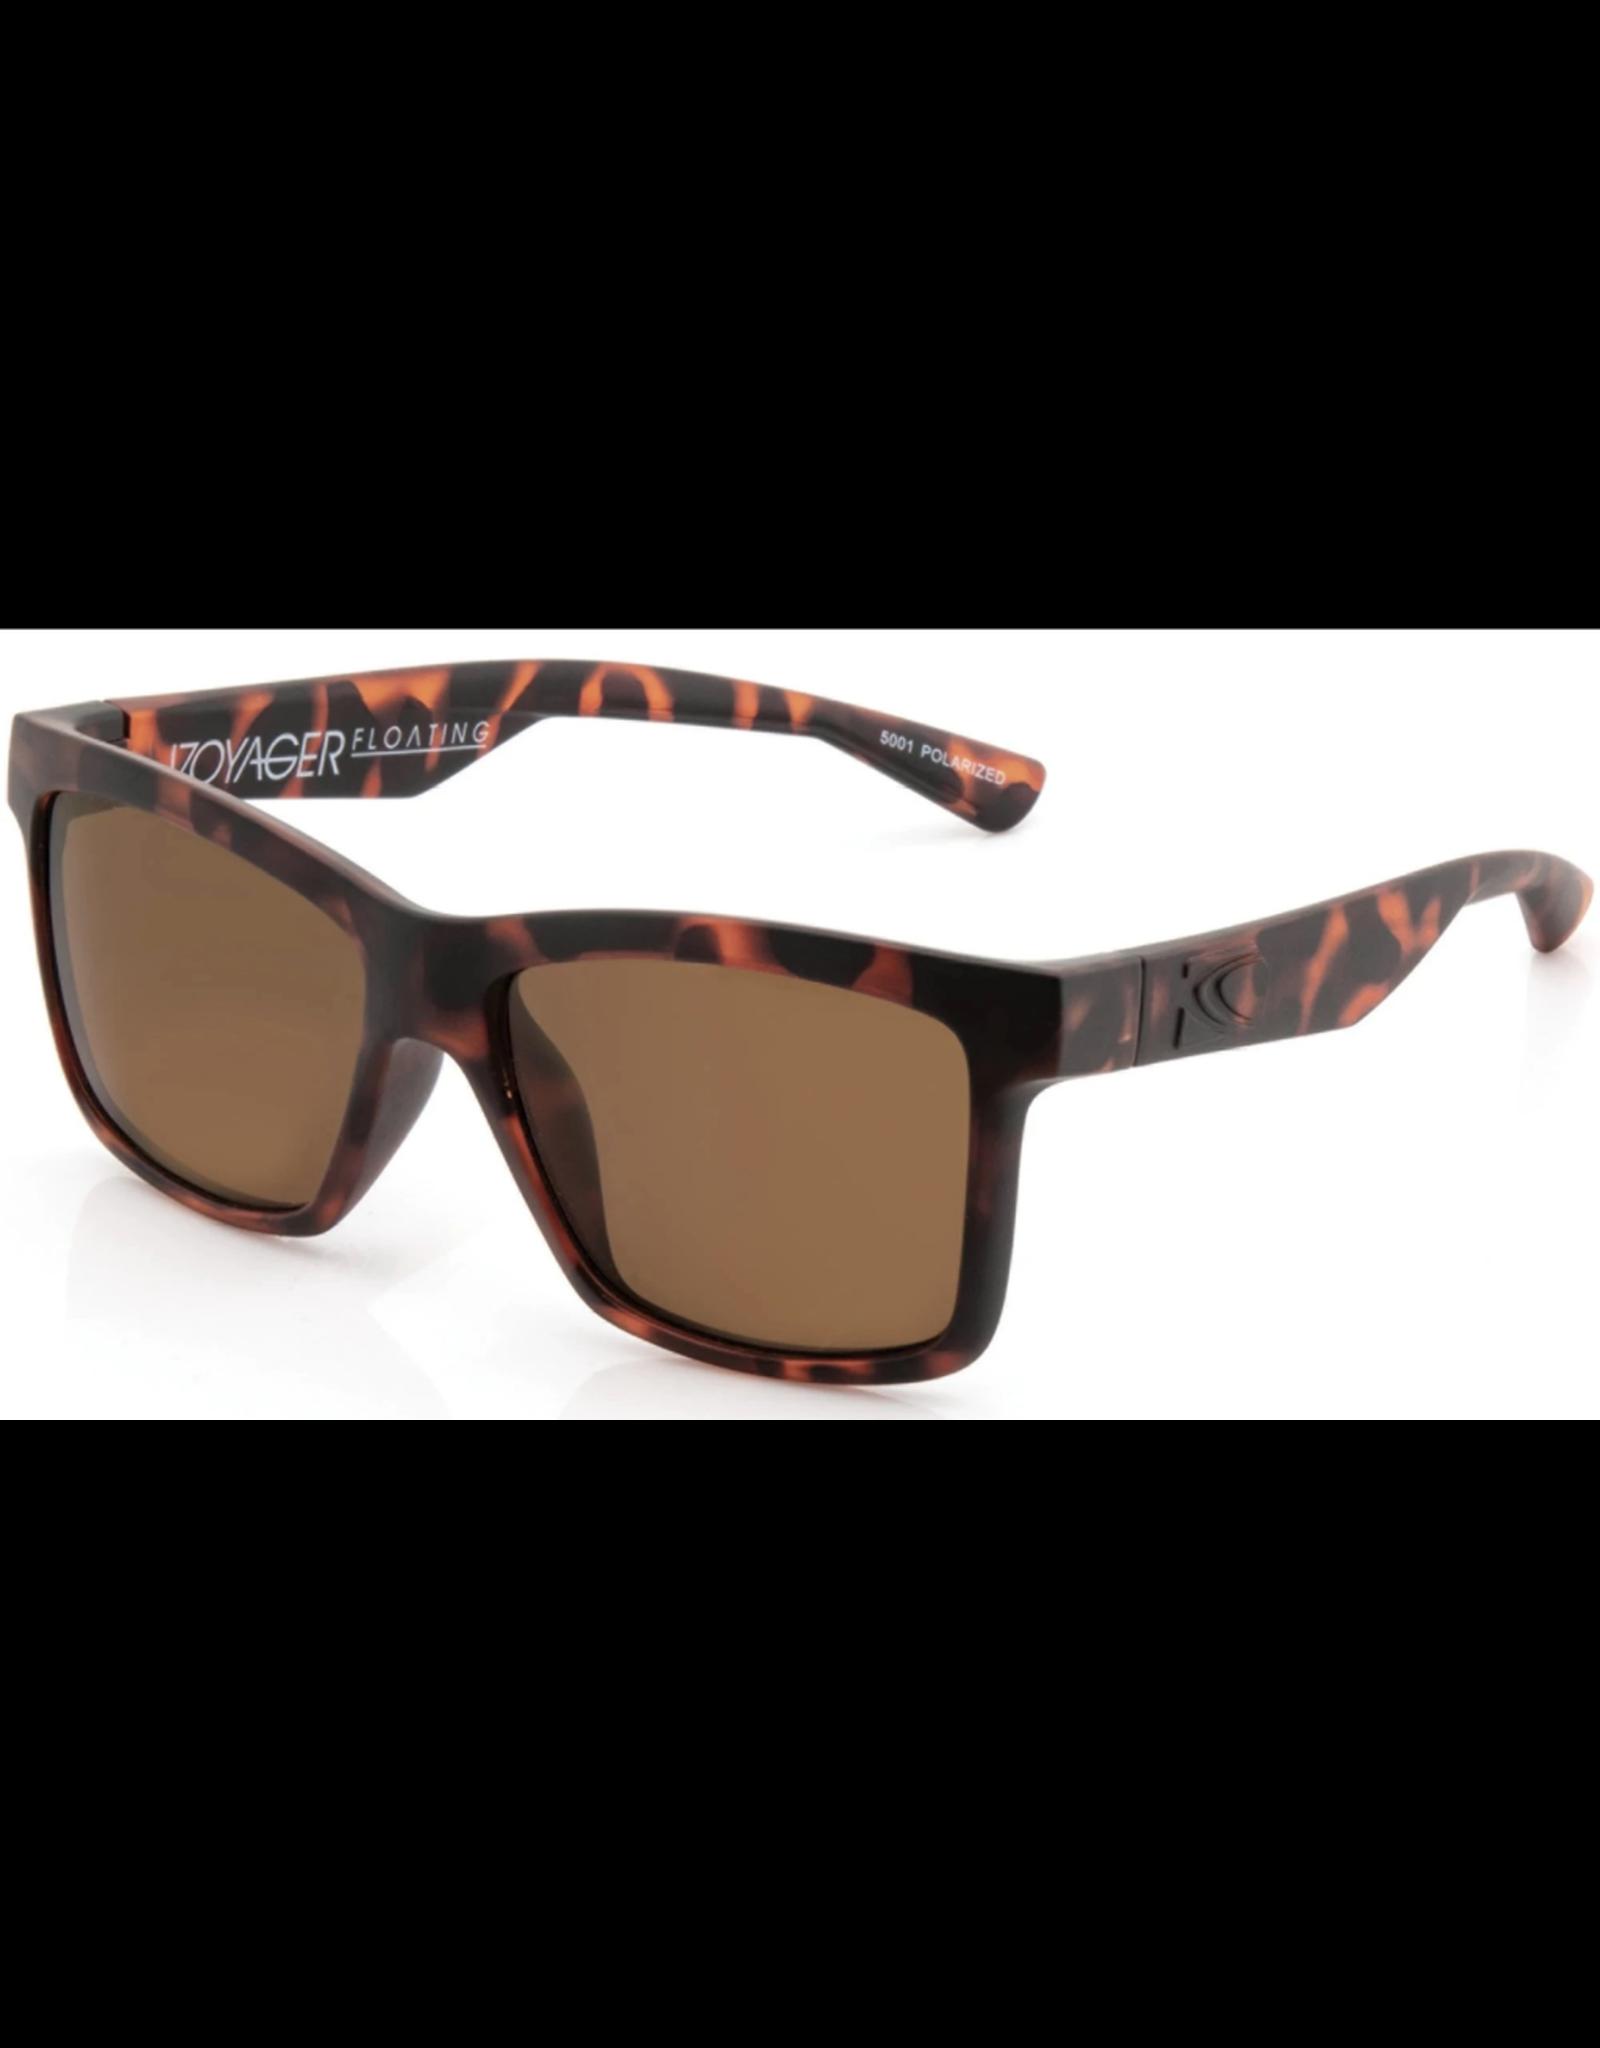 CARVE SUNGLASSES CARVE VOYAGER Polarized FLOATABLE Sunglasses